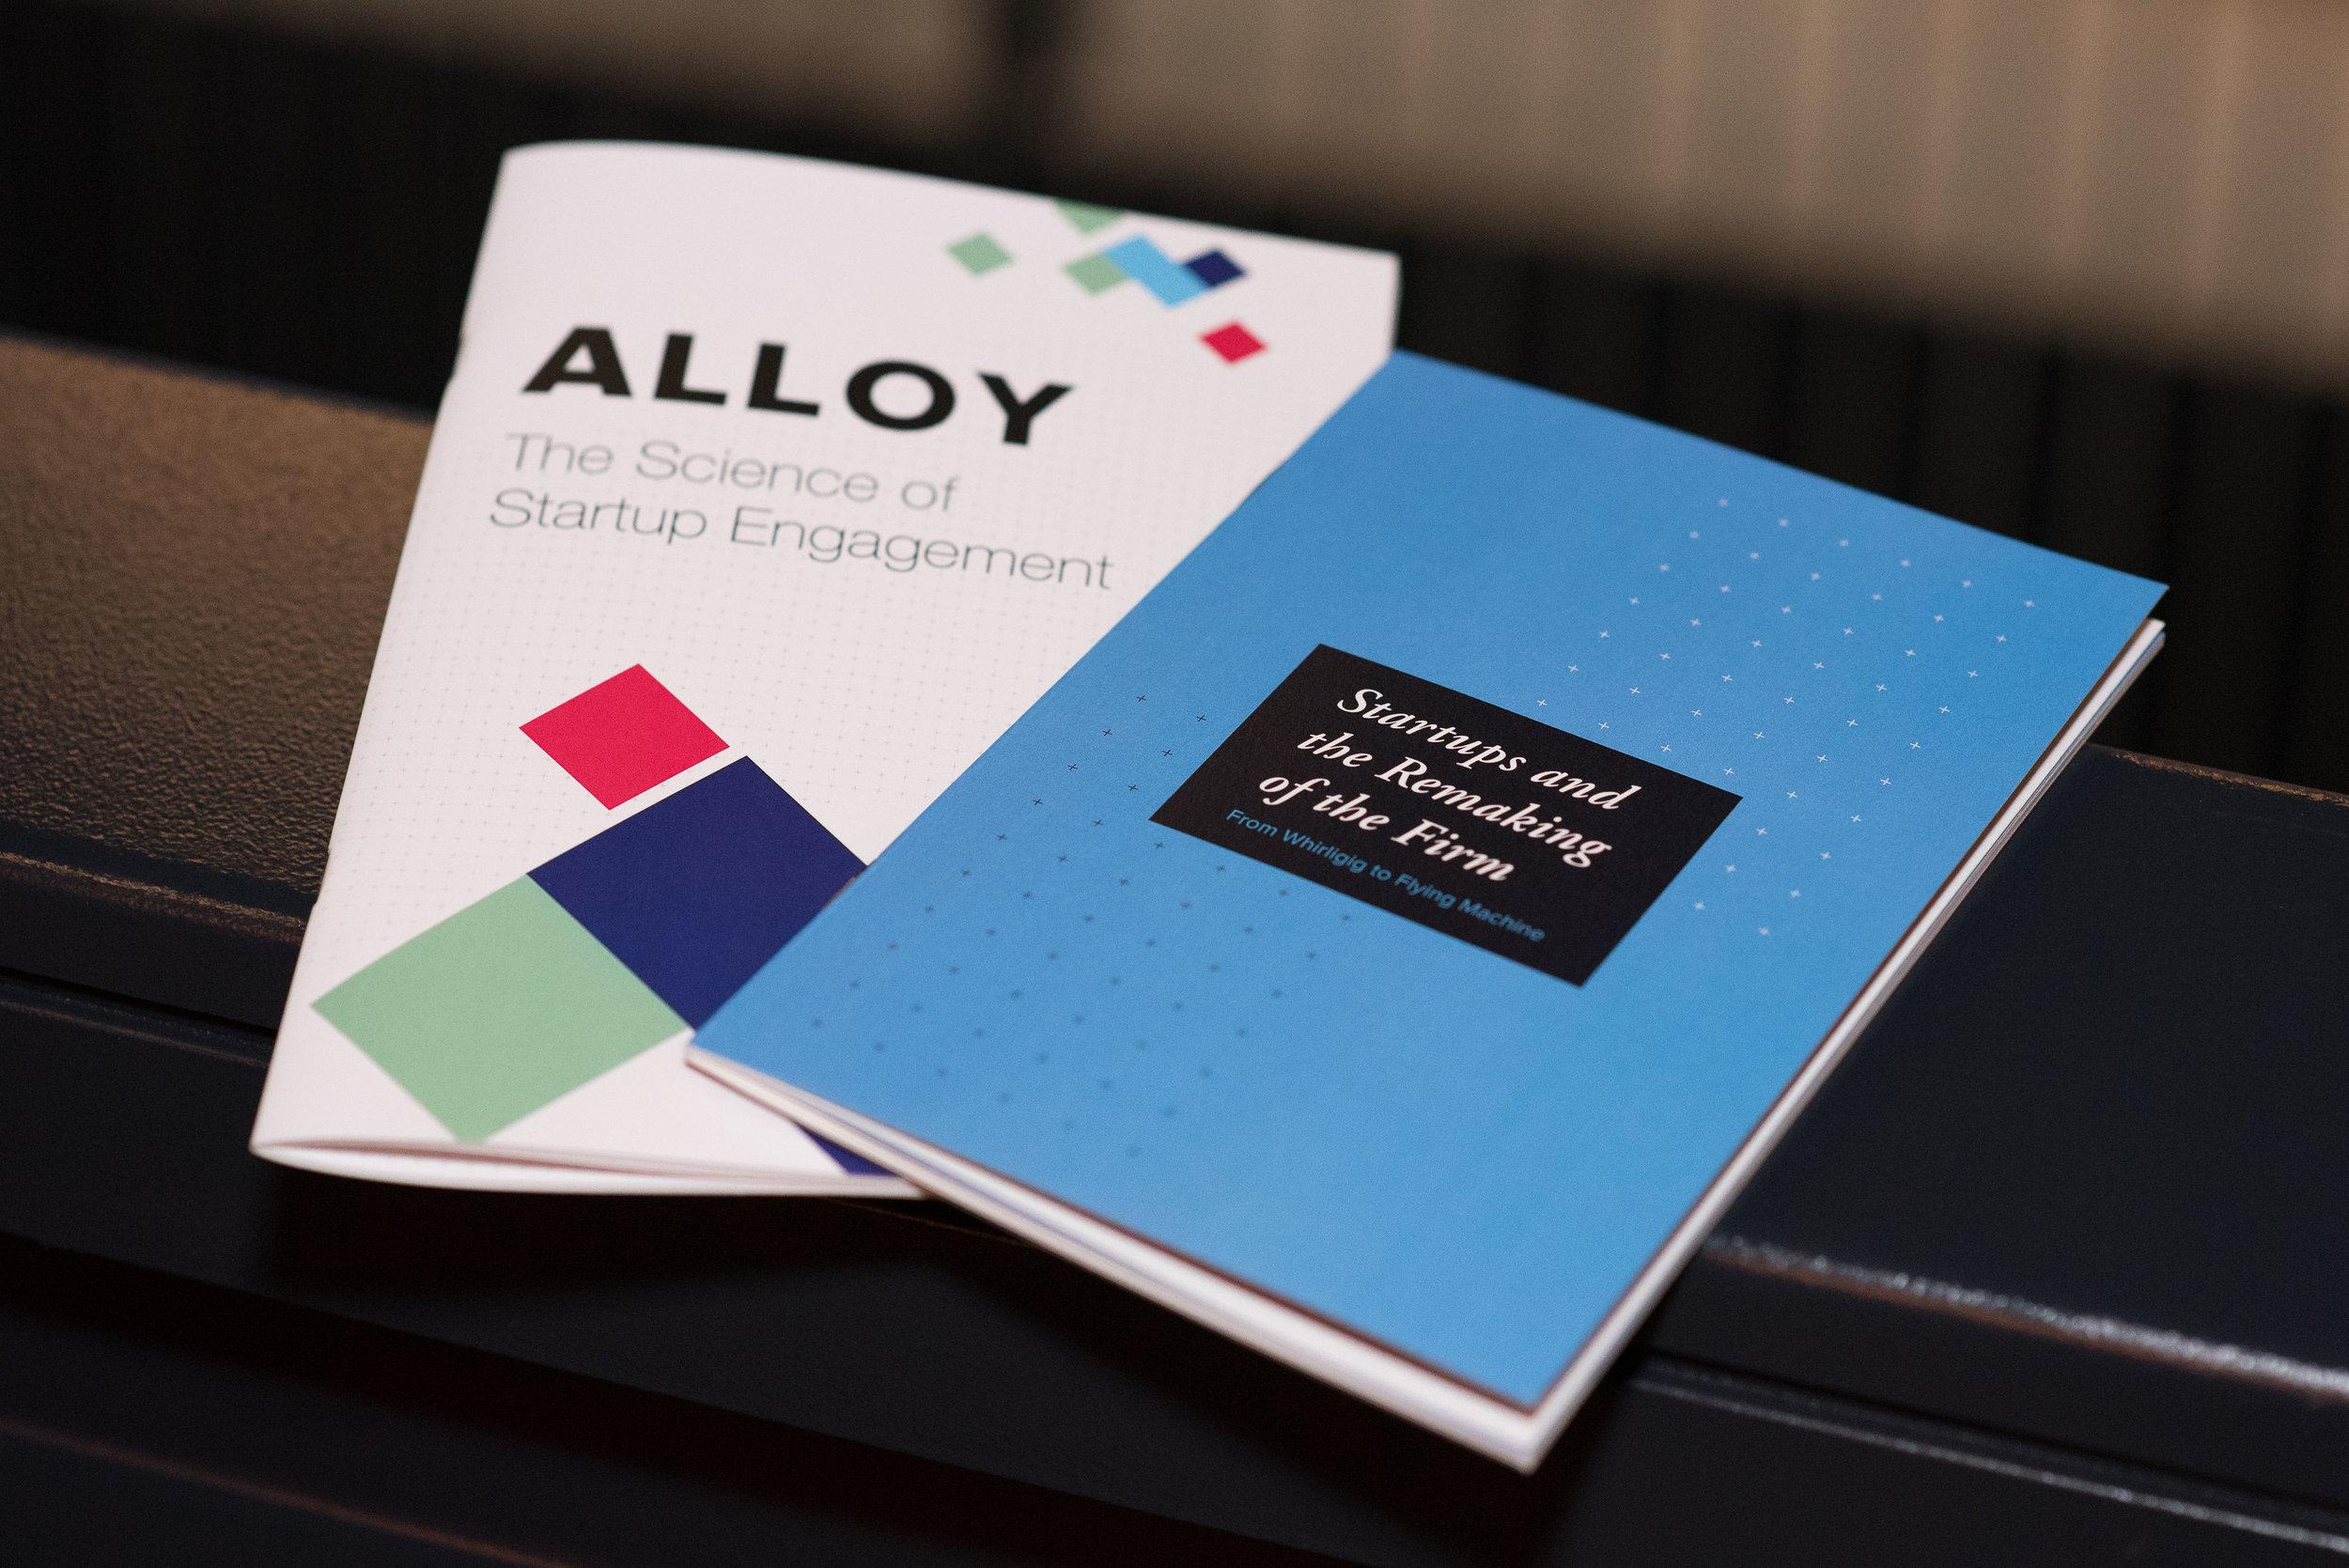 alloy-19-sf-jazz-center113.jpg